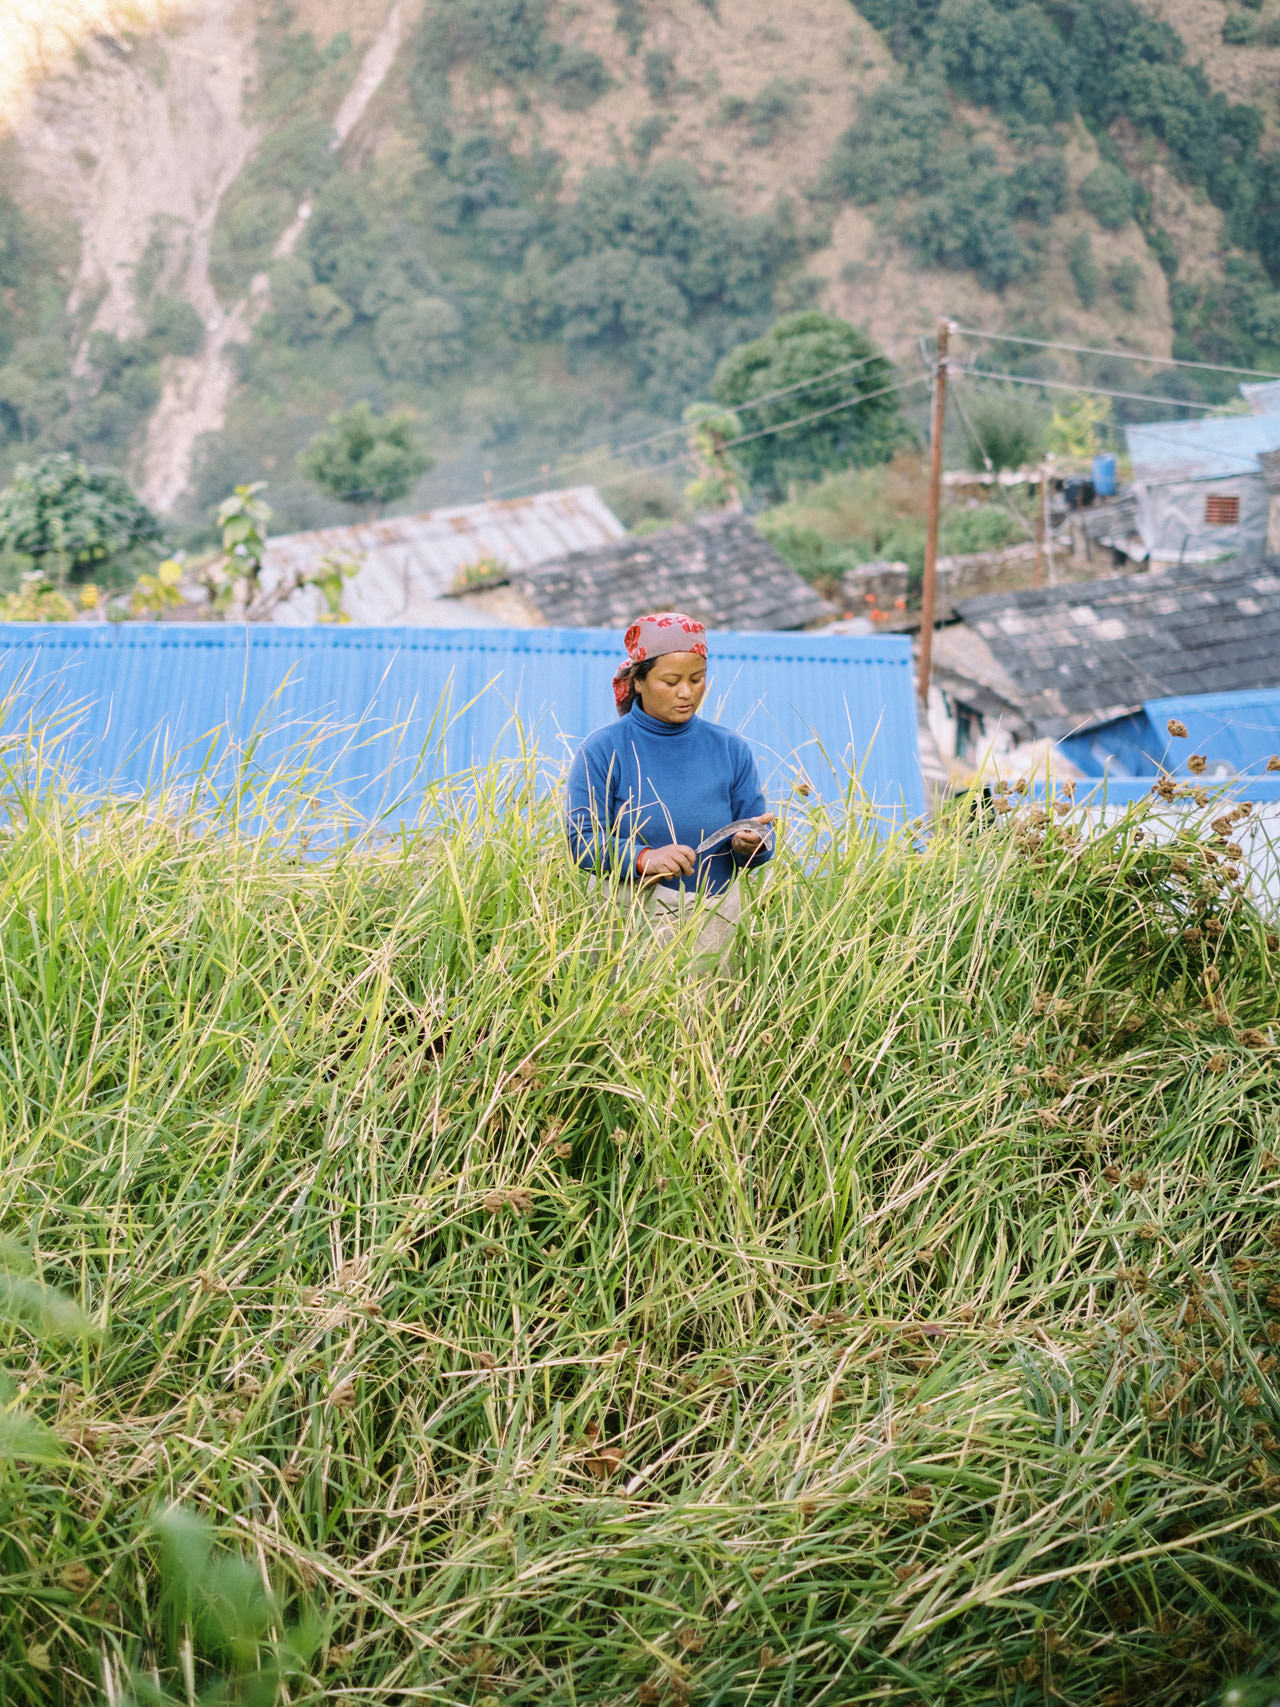 Nepal 2019 - Trekking Annapurna Base Camp 75